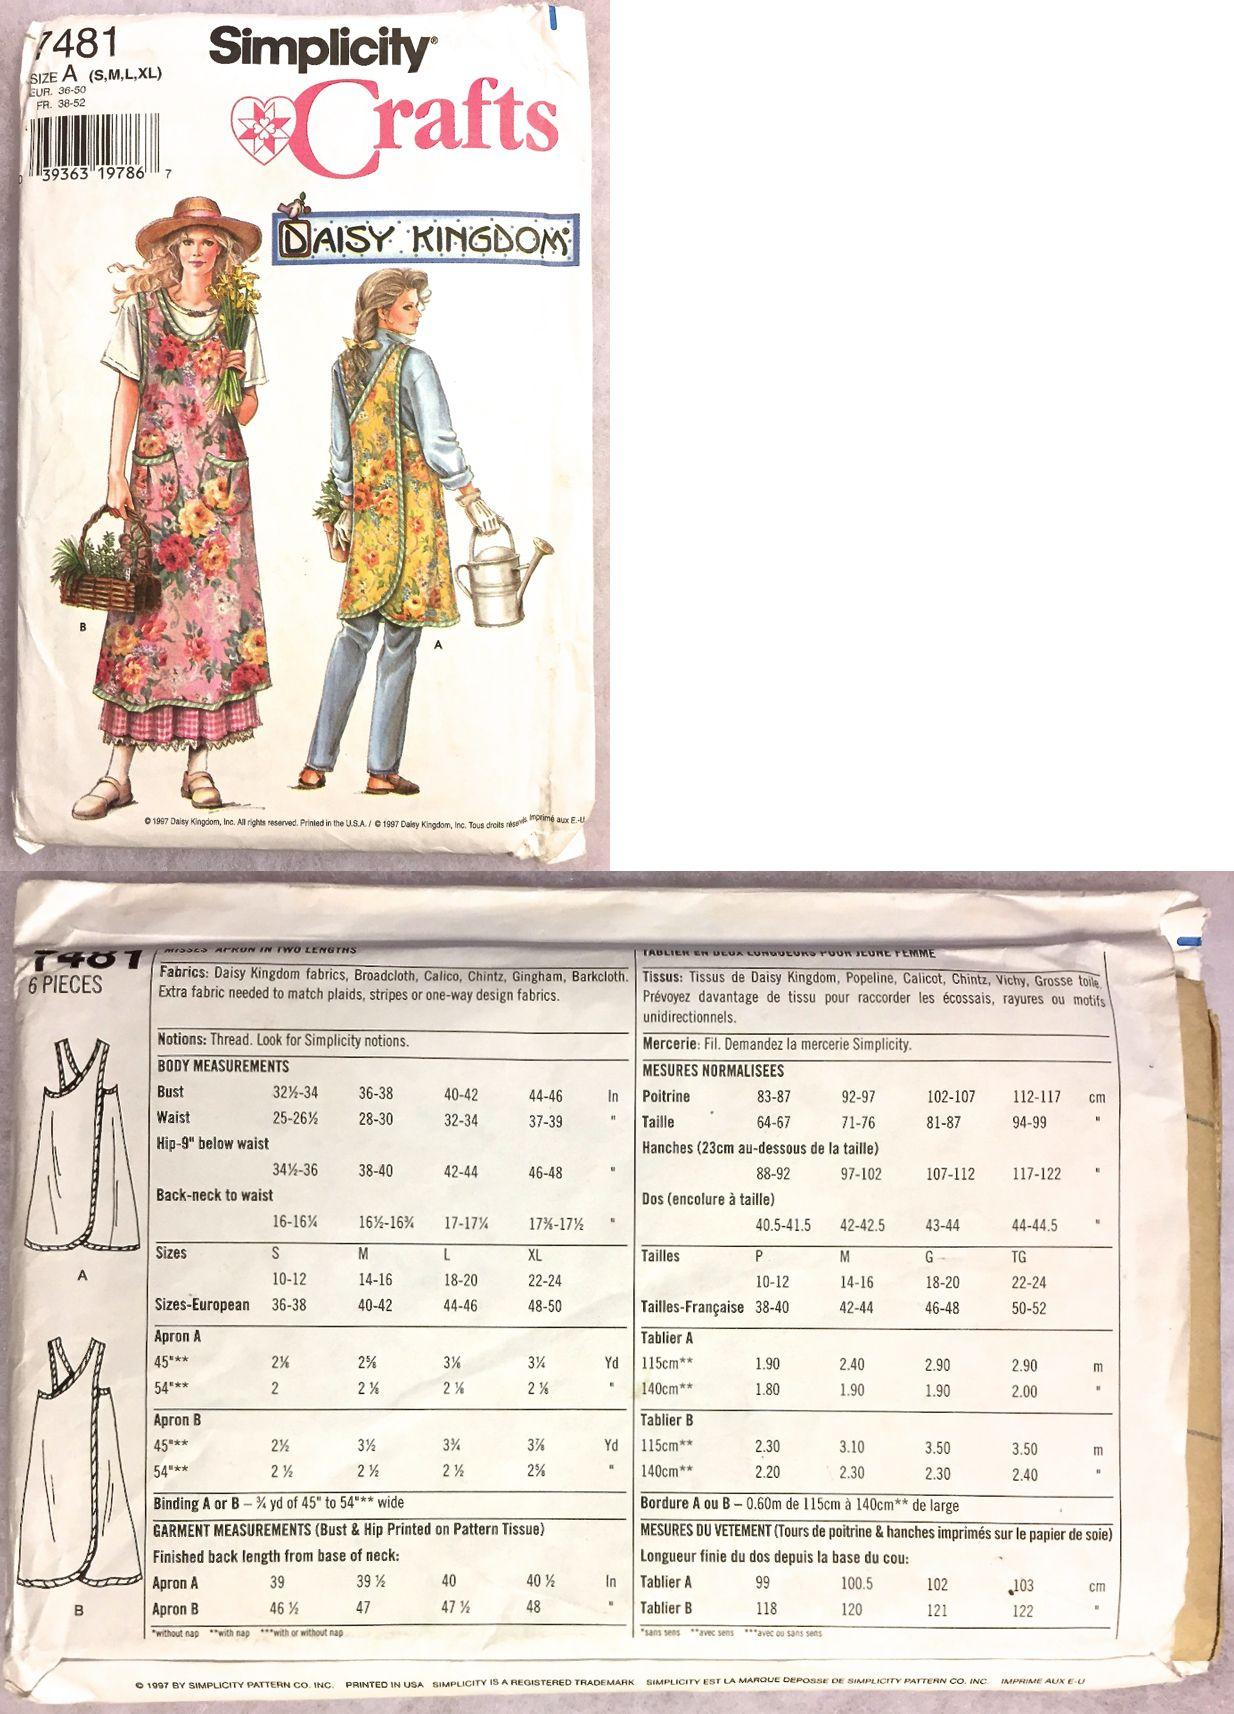 Sewing patterns 28174 apron sewing pattern daisy kingdom plus sewing patterns 28174 apron sewing pattern daisy kingdom plus size smock rare htf simplicity 7481 jeuxipadfo Images